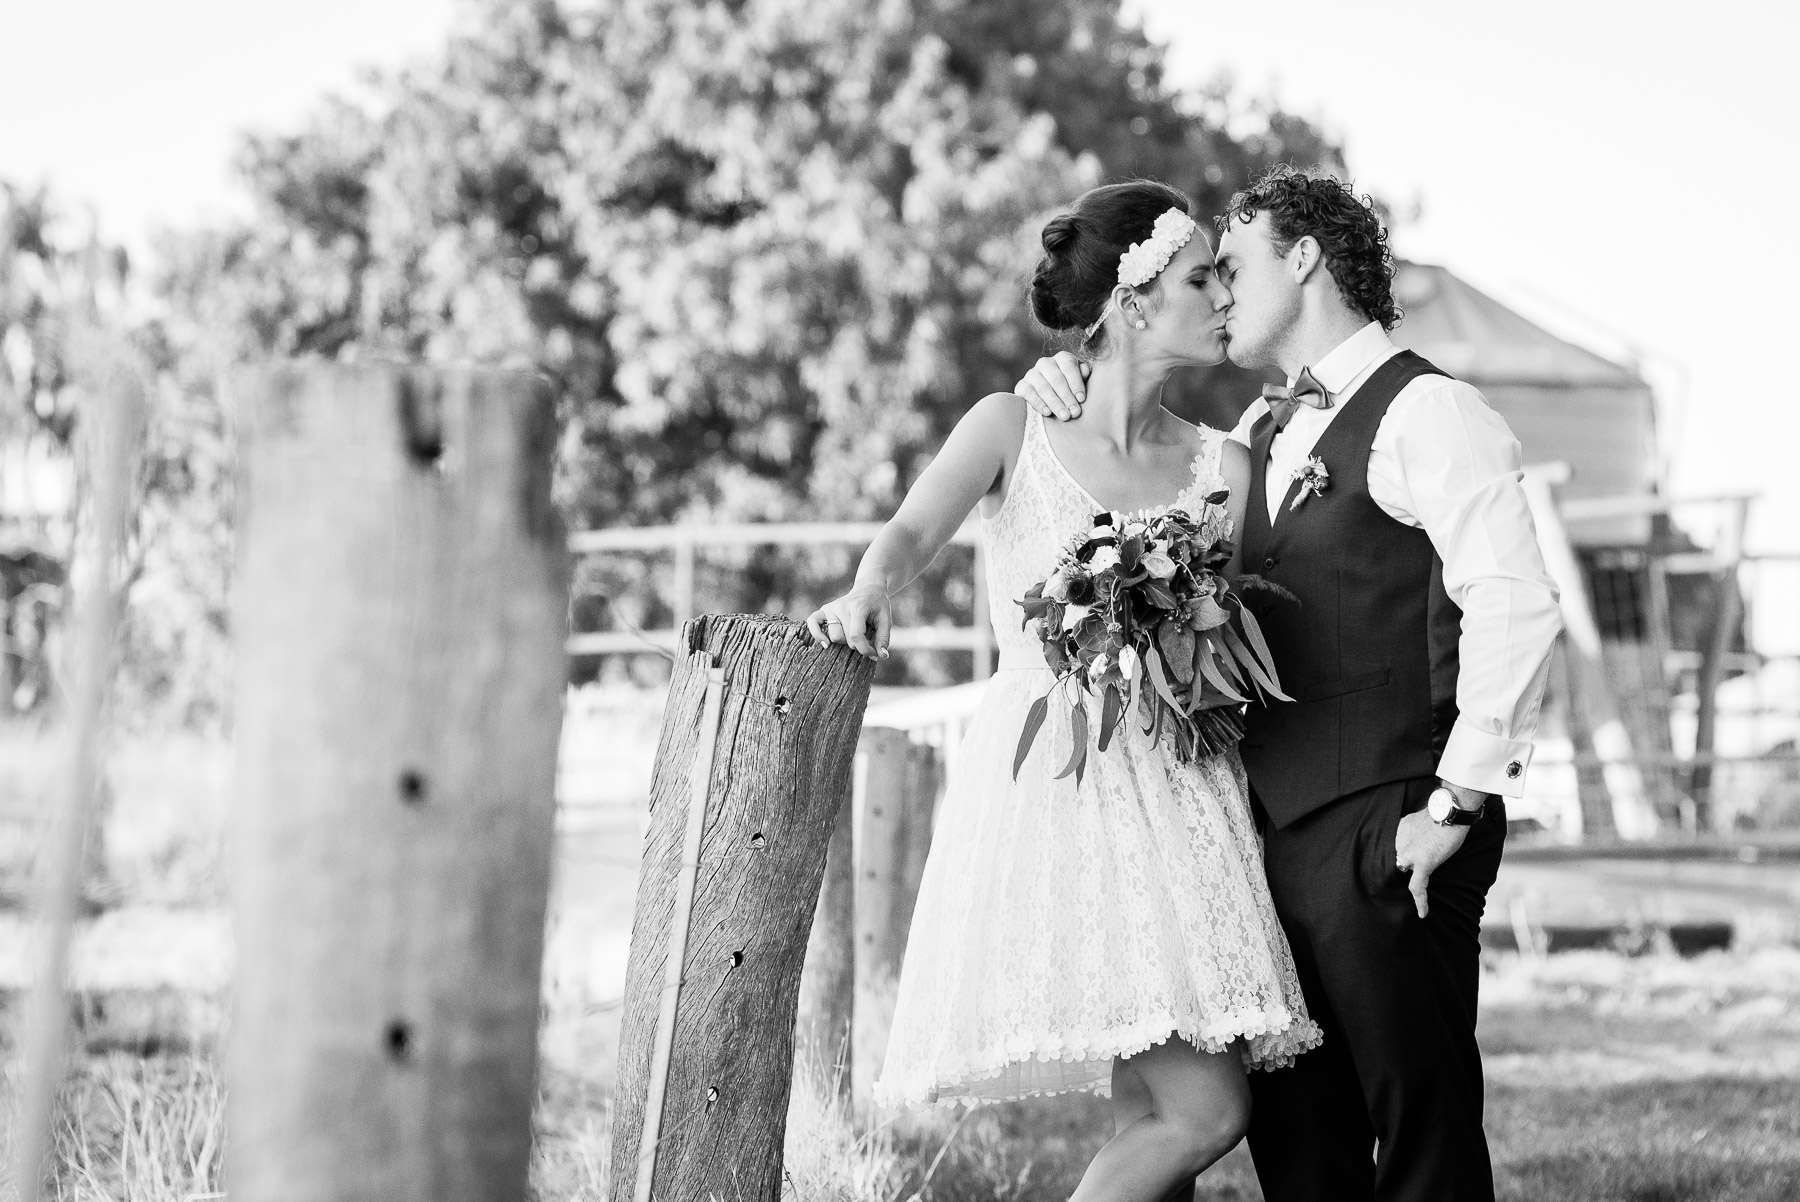 Melissa_and_Kristan_Echuca_Farm_Wedding_New_Years_Eve-101.jpg